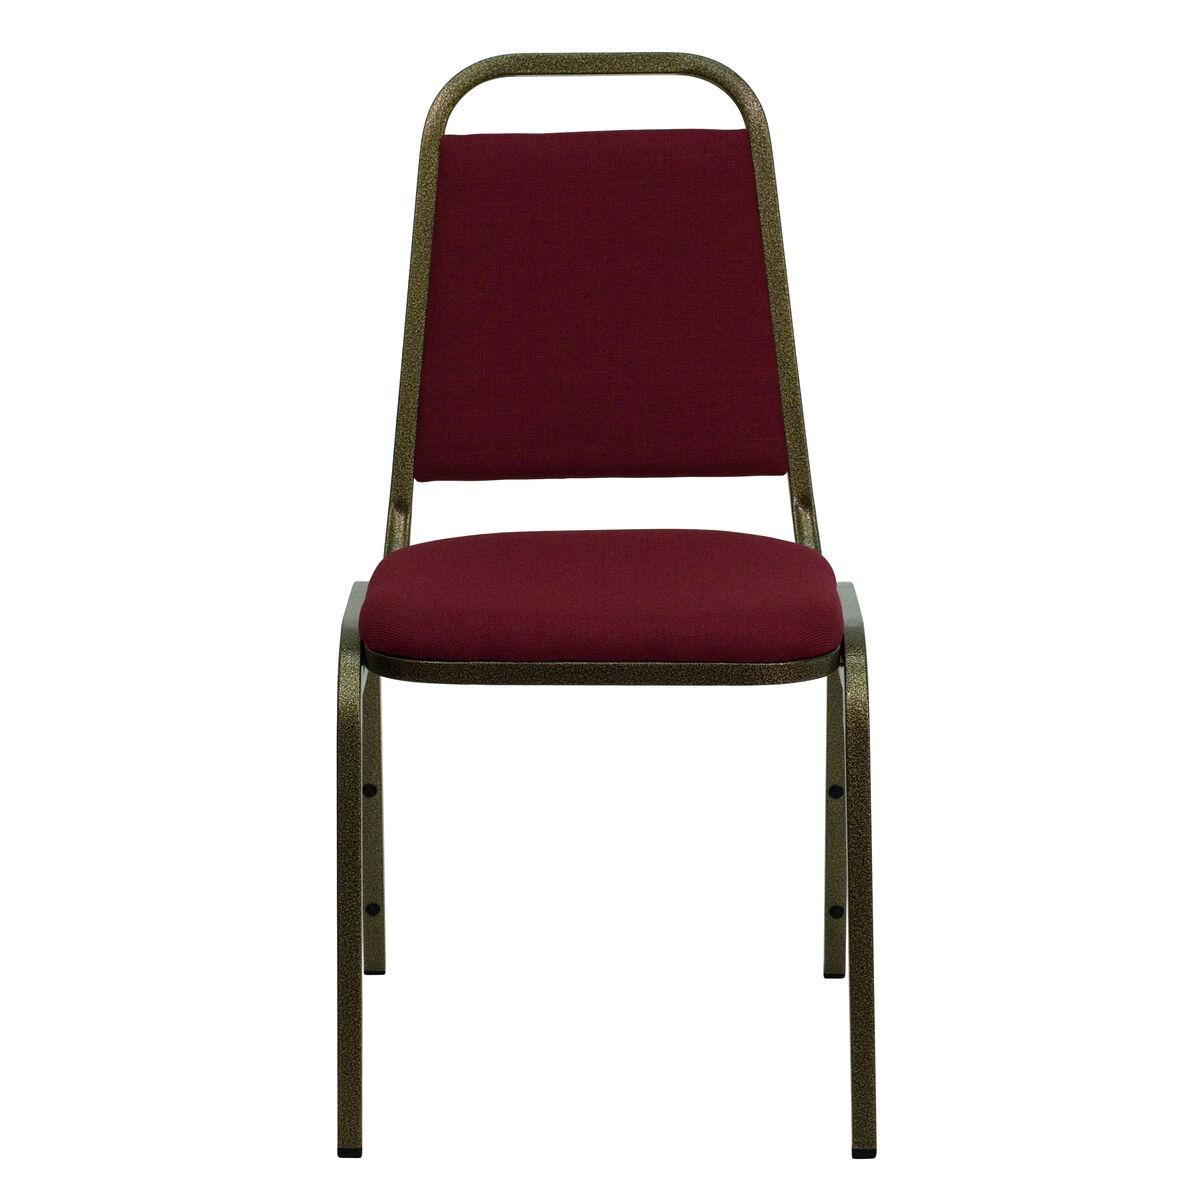 Burgundy Fabric Banquet Chair Fd Bhf 2 By Gg